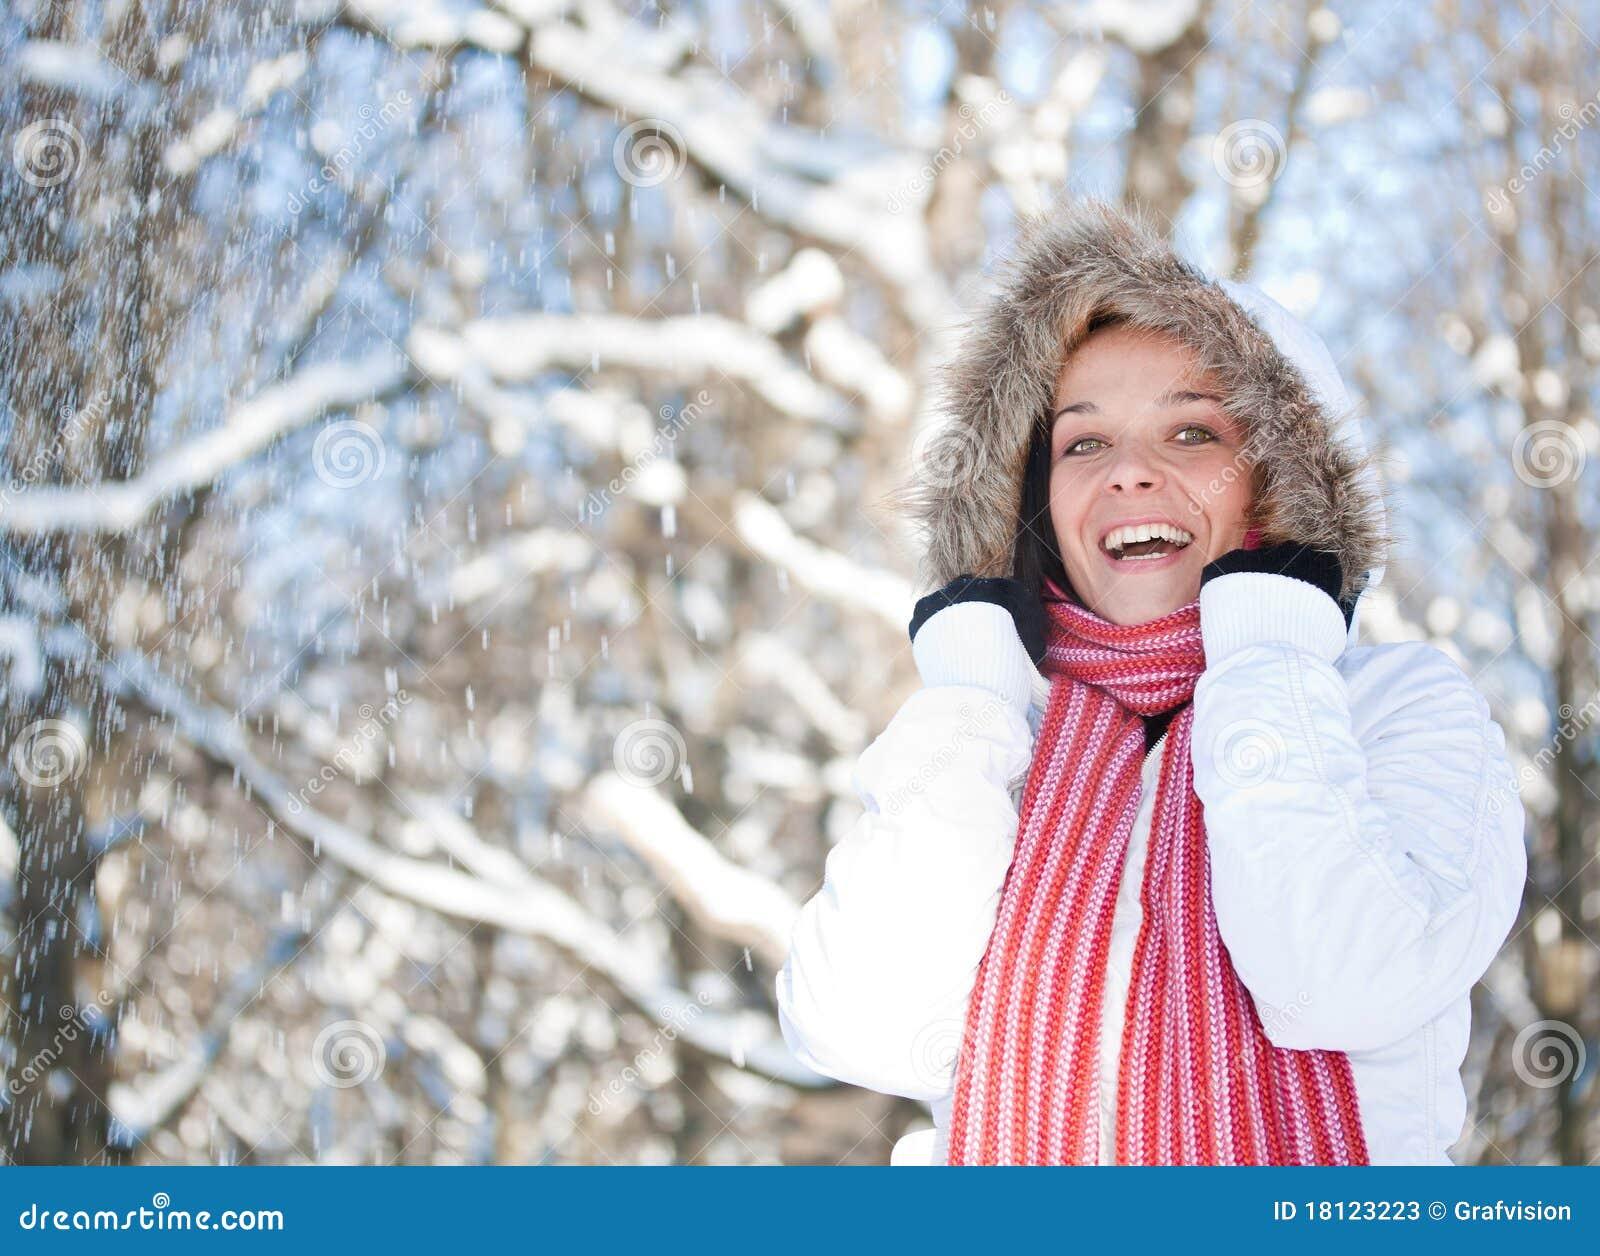 Original Latvian Woman Winter 91